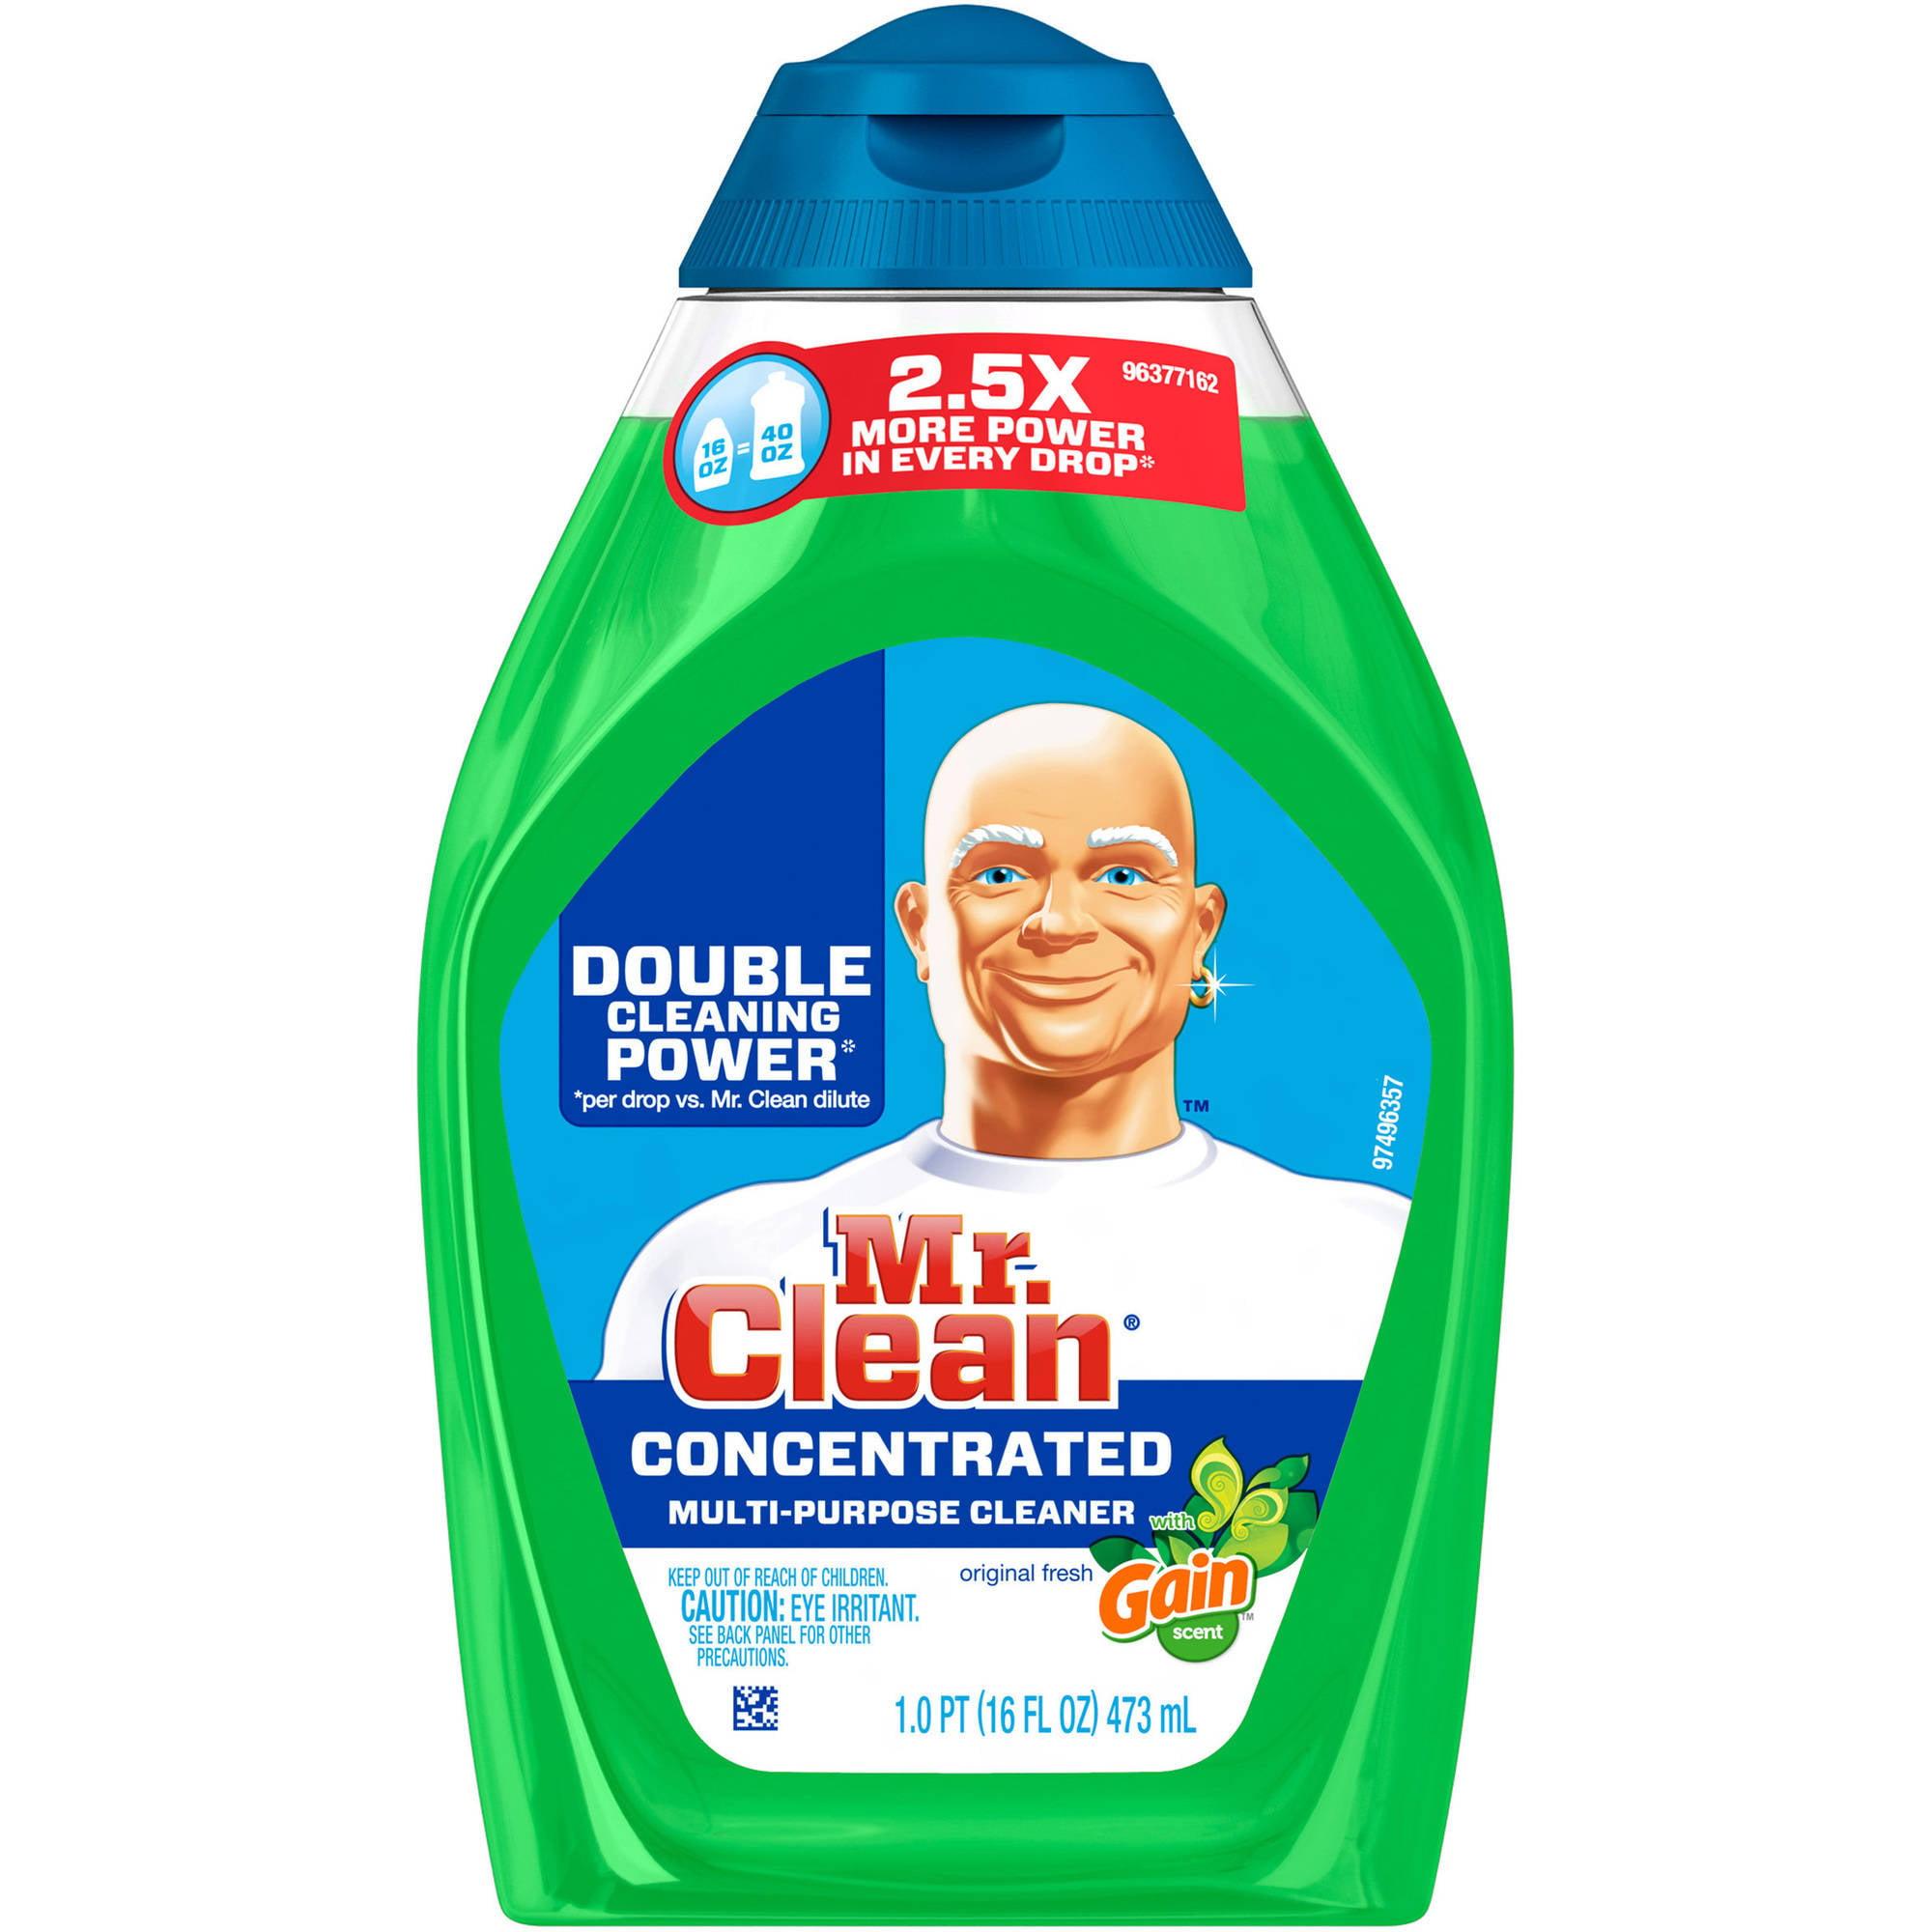 Mr. Clean Gain Original Fresh Scent Concentrated Multi-Purpose Cleaner, 16 oz